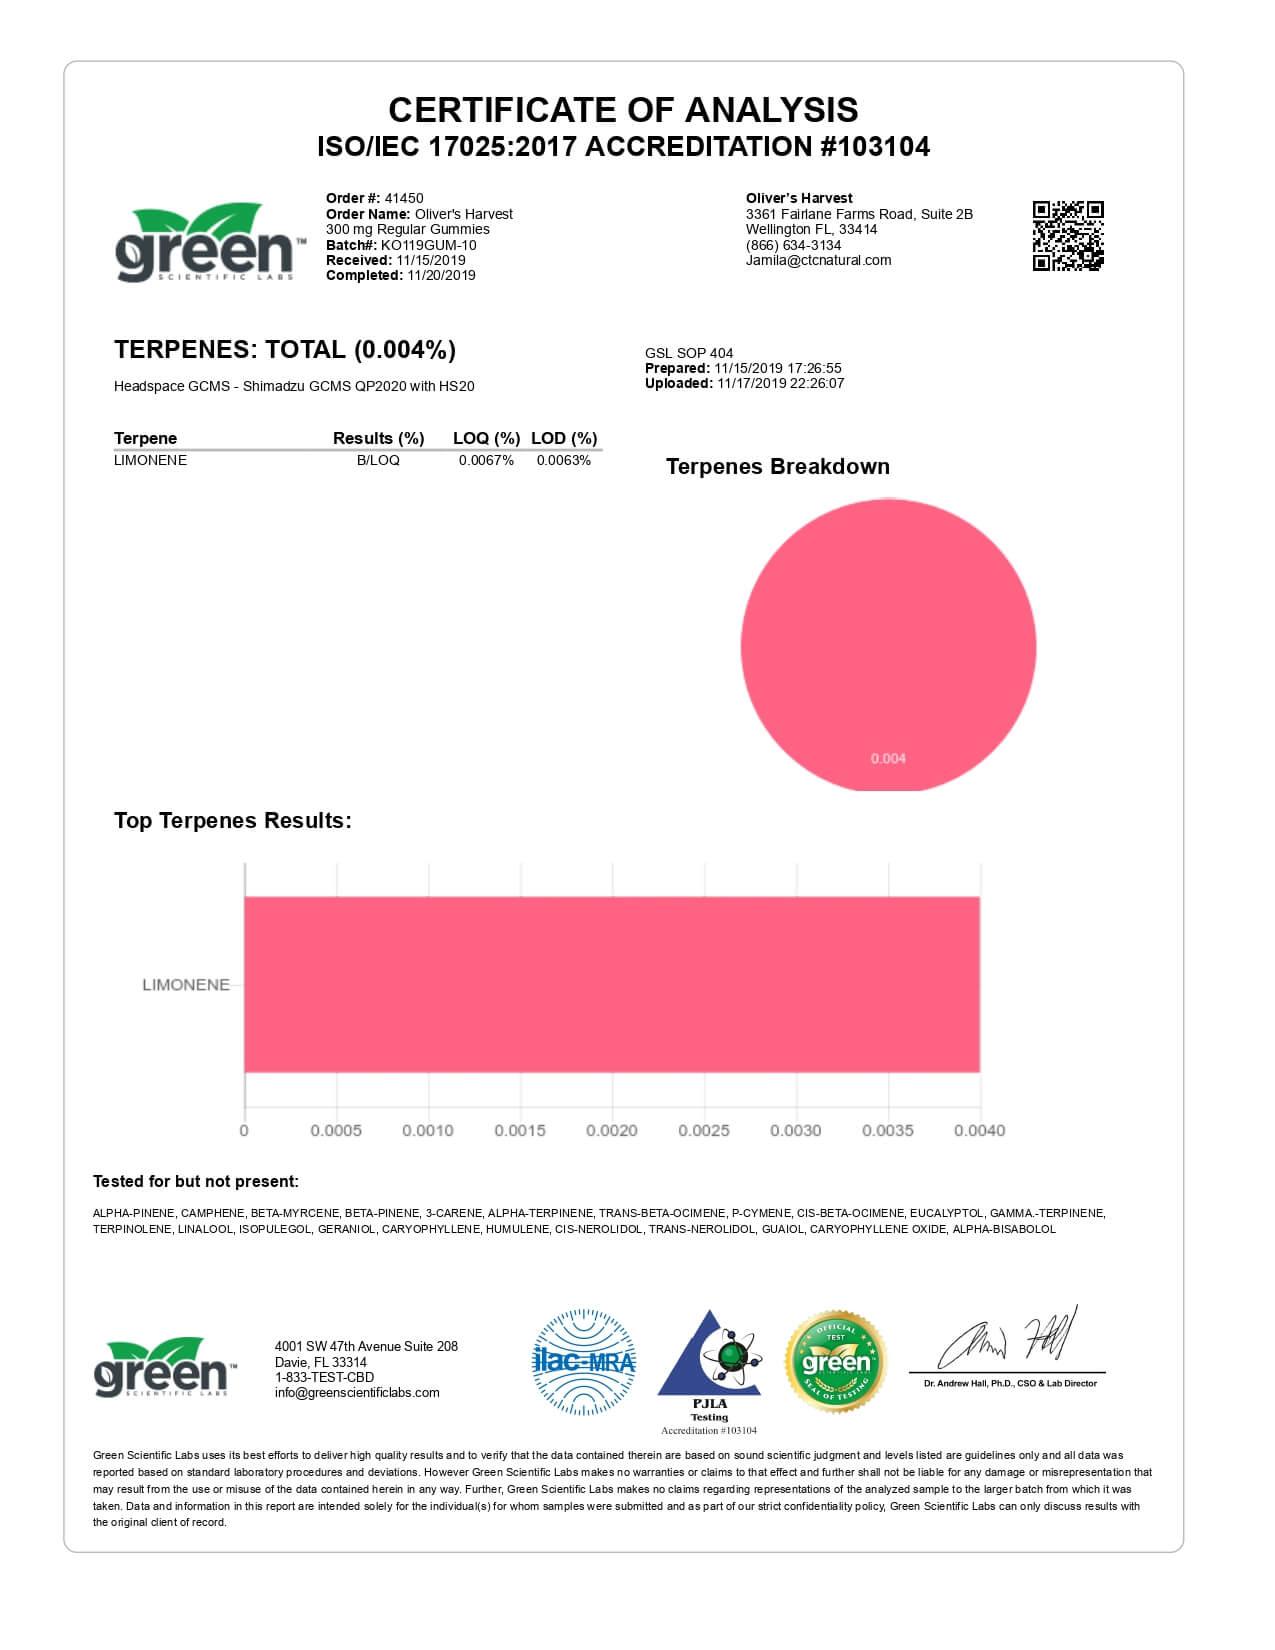 Oliver's Harvest CBD Edible Broad Spectrum Gummies 300mg Lab Report